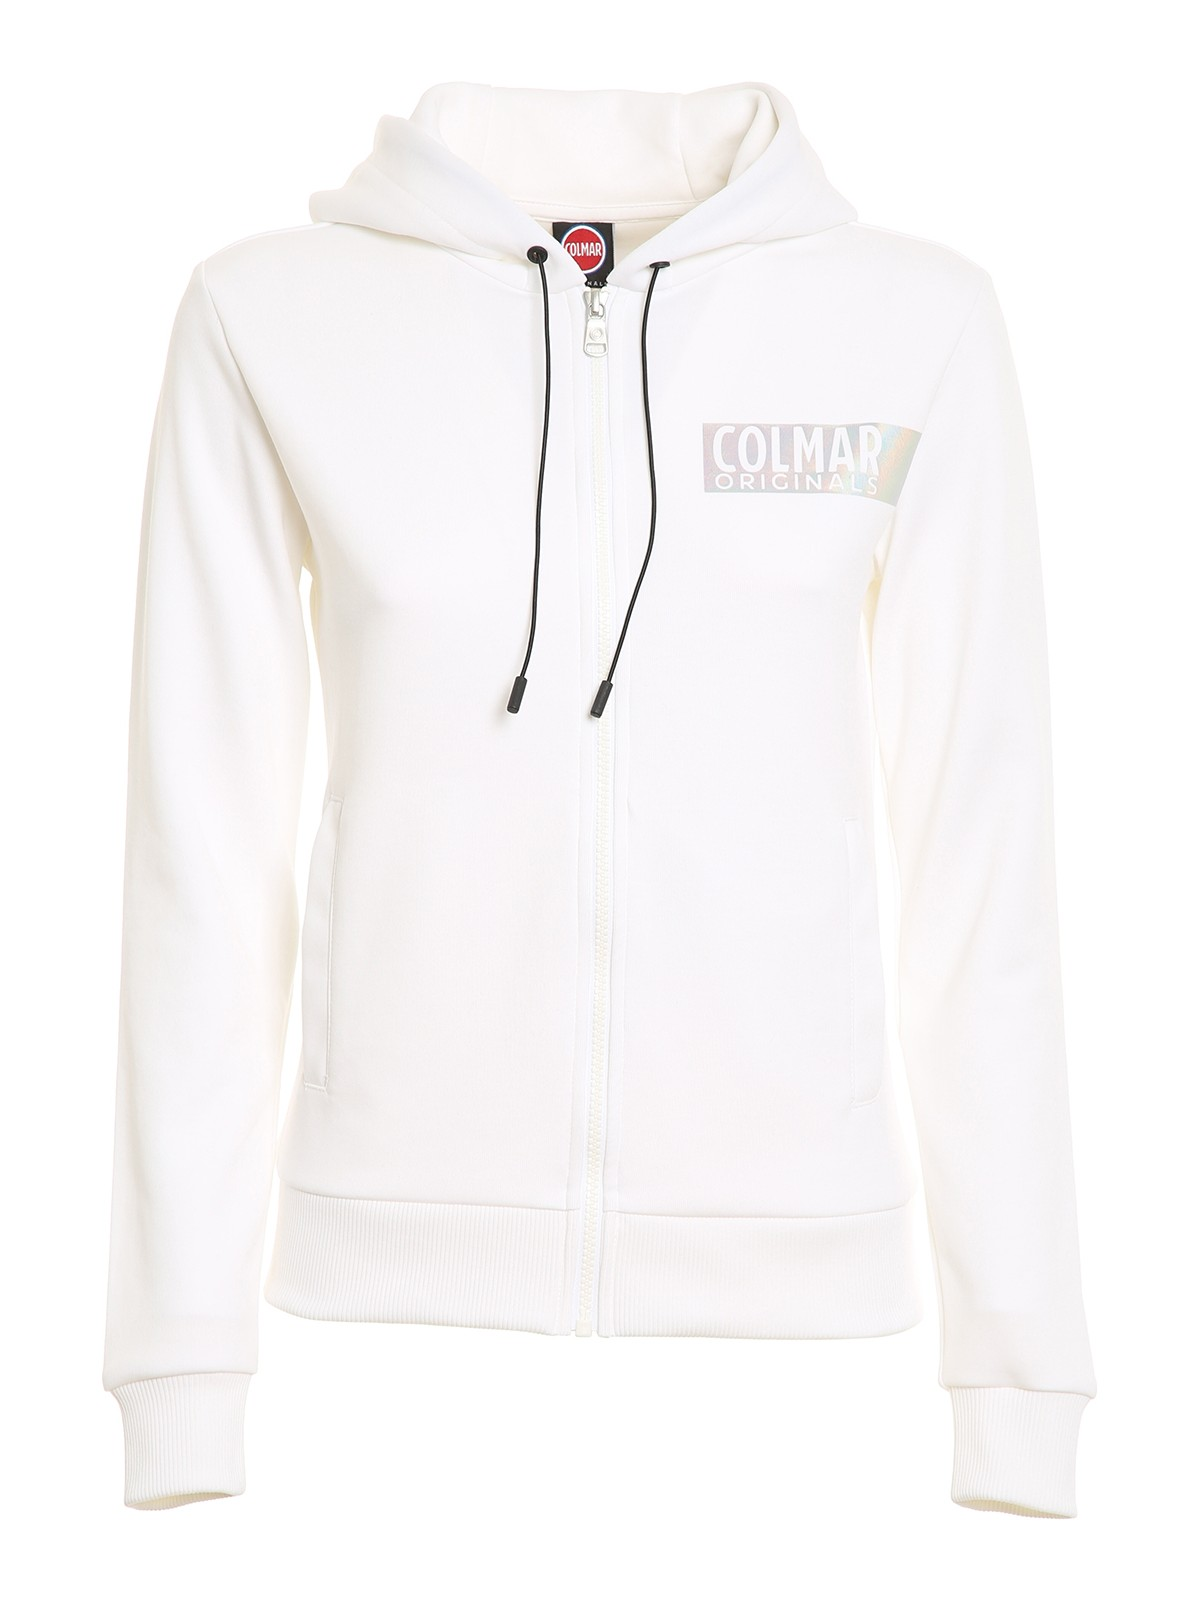 Colmar Originals Cottons IRIDESCENT LOGO HOODIE